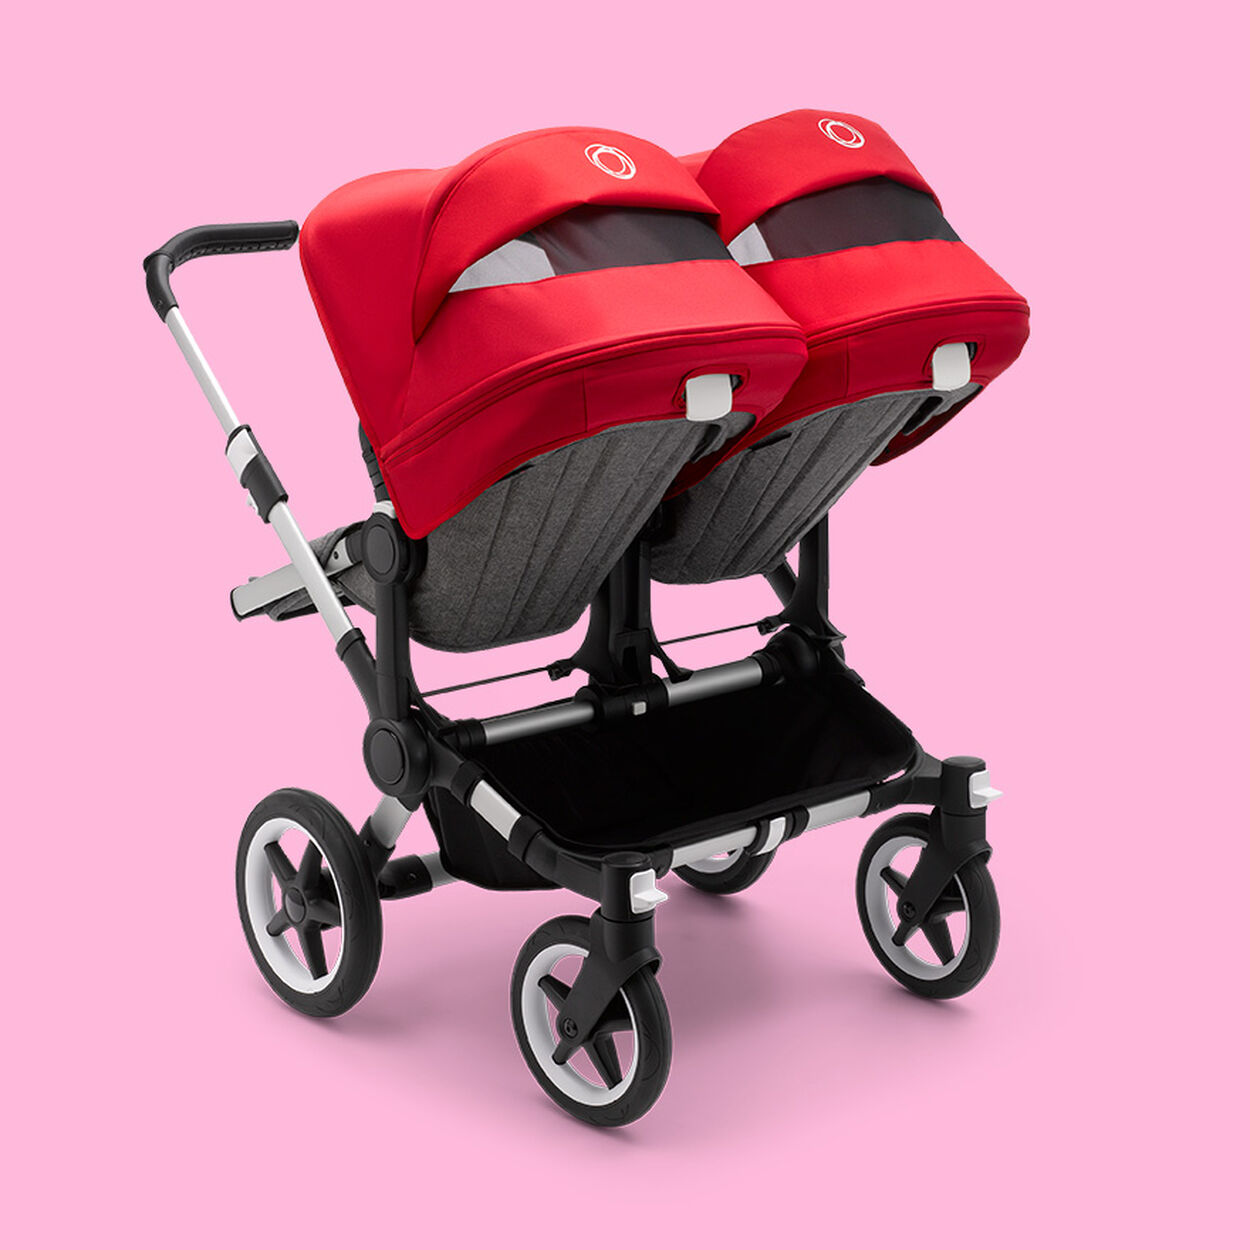 Back of Donkey 3 Twin stroller